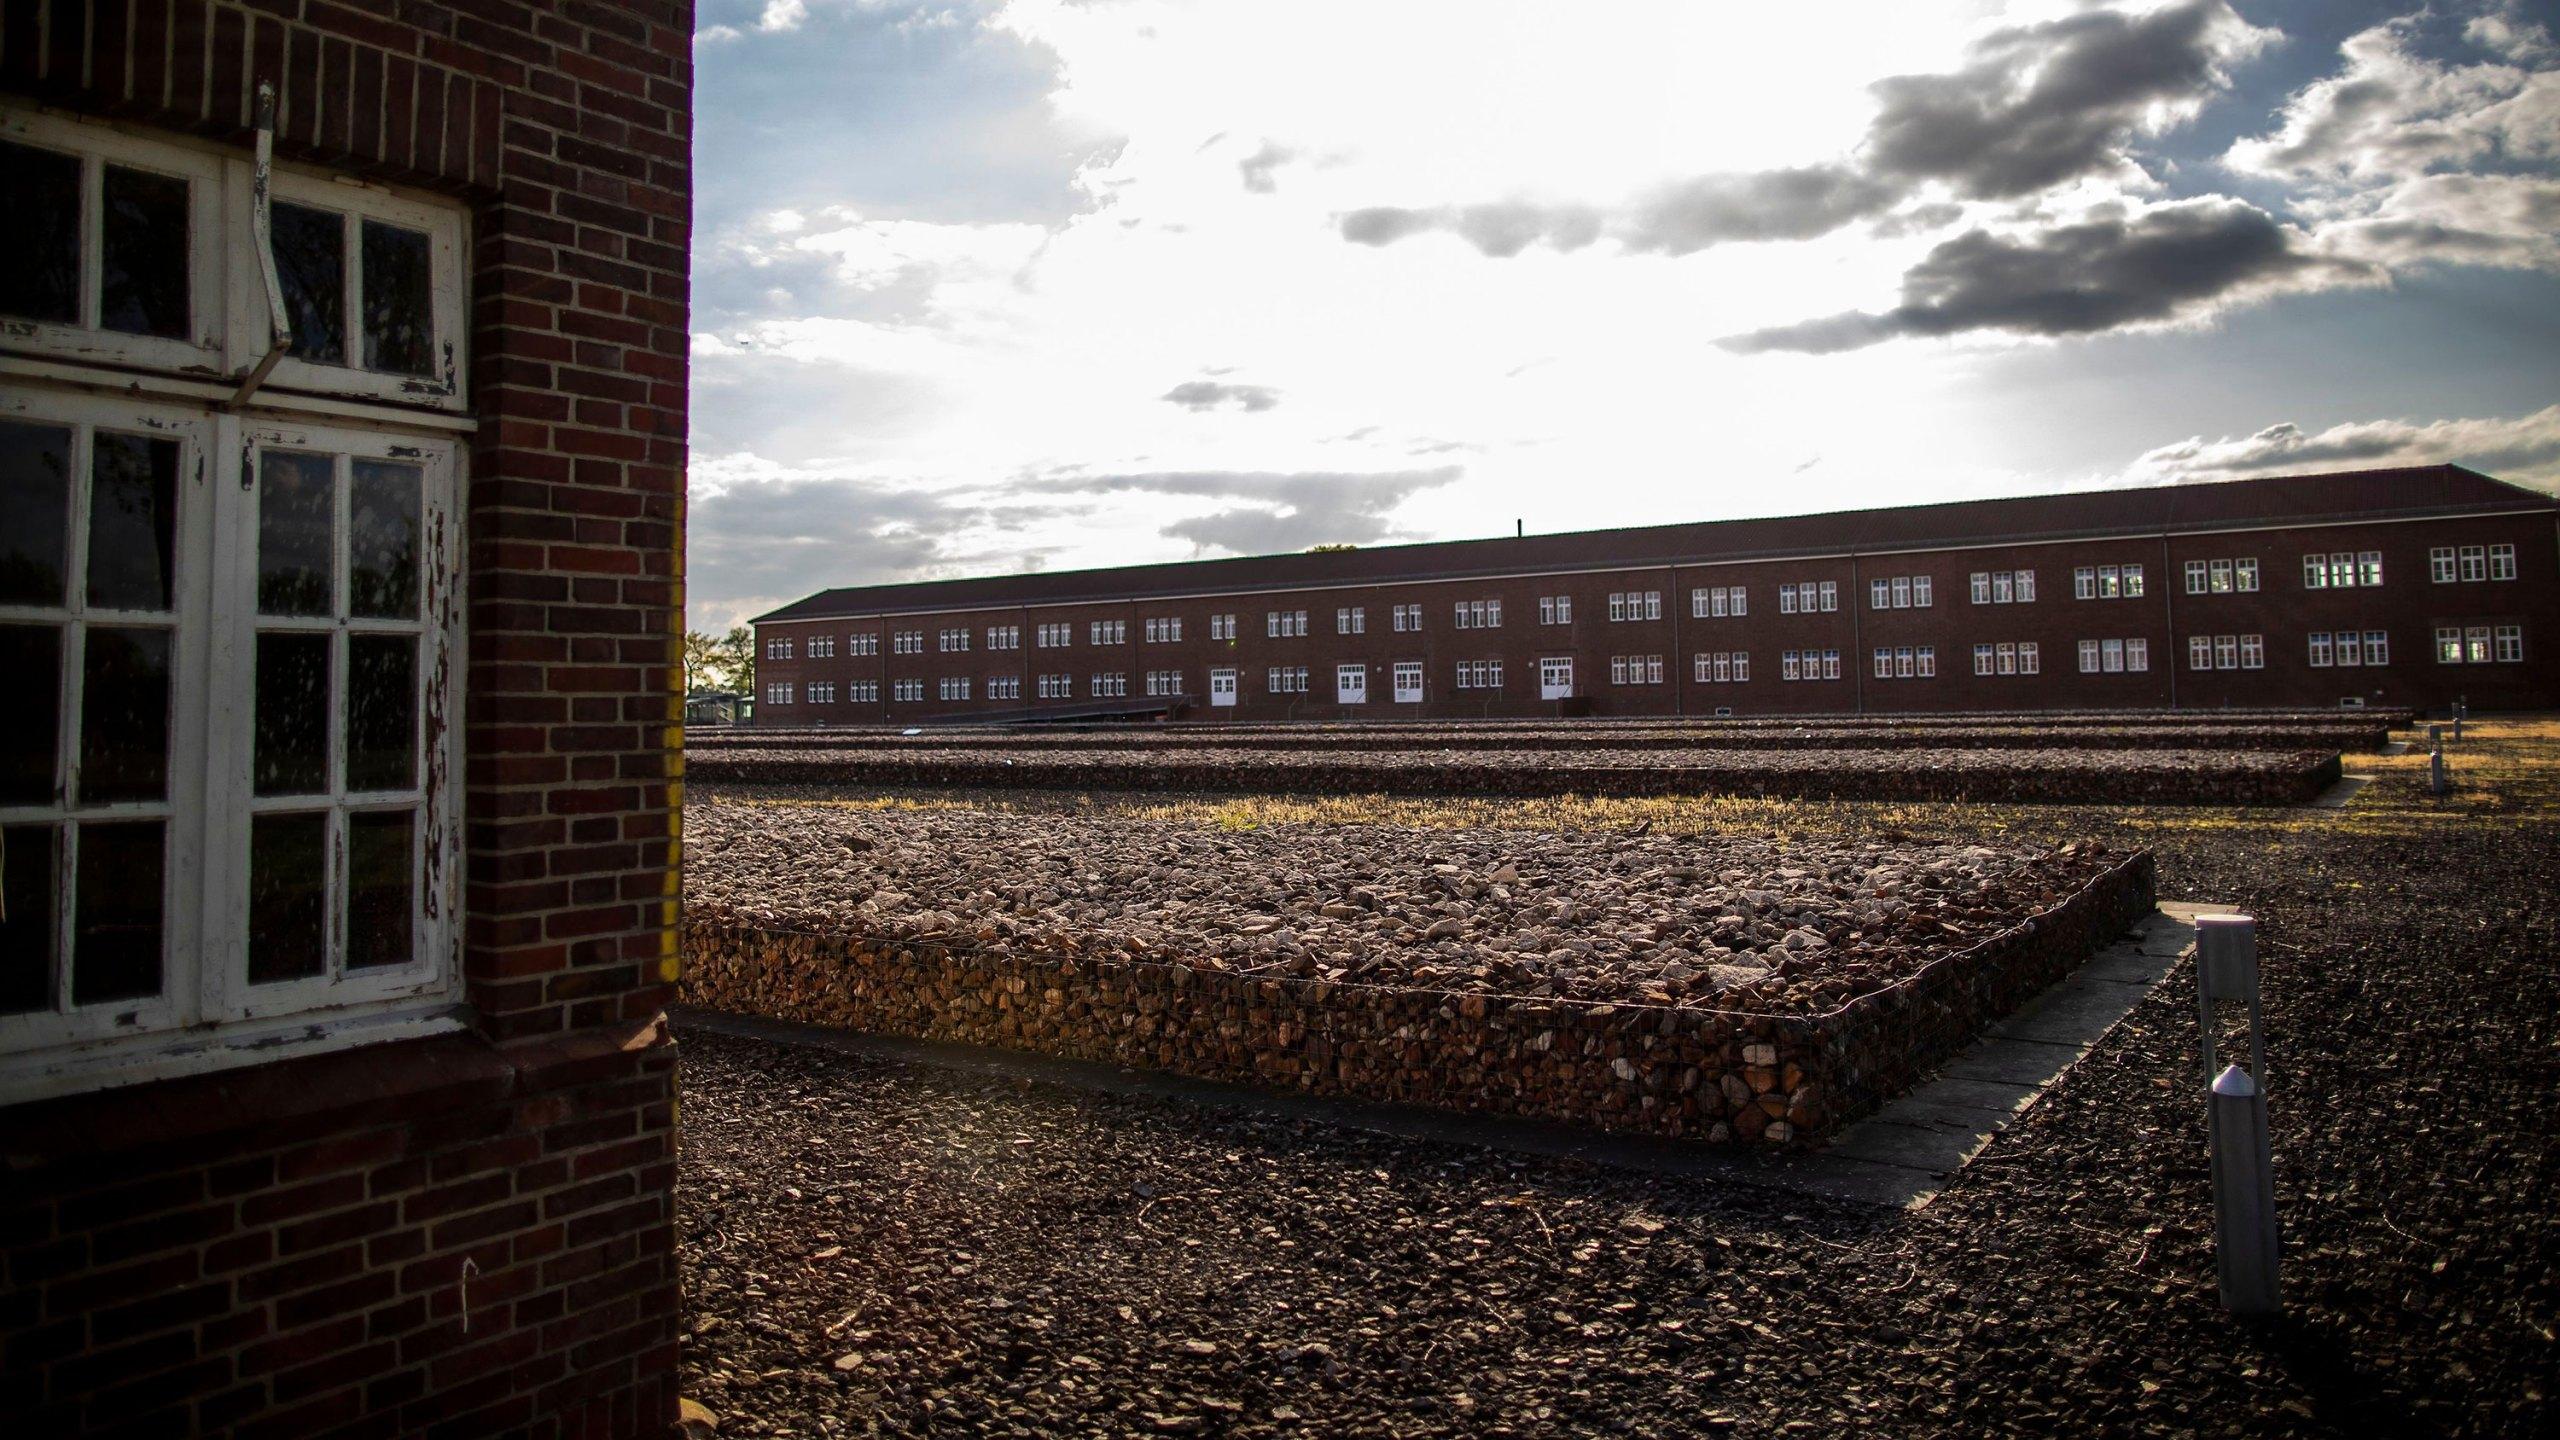 Former concentration camp near Neuengamme (Srdjan Suki/EPA-EFE/Shutterstock)